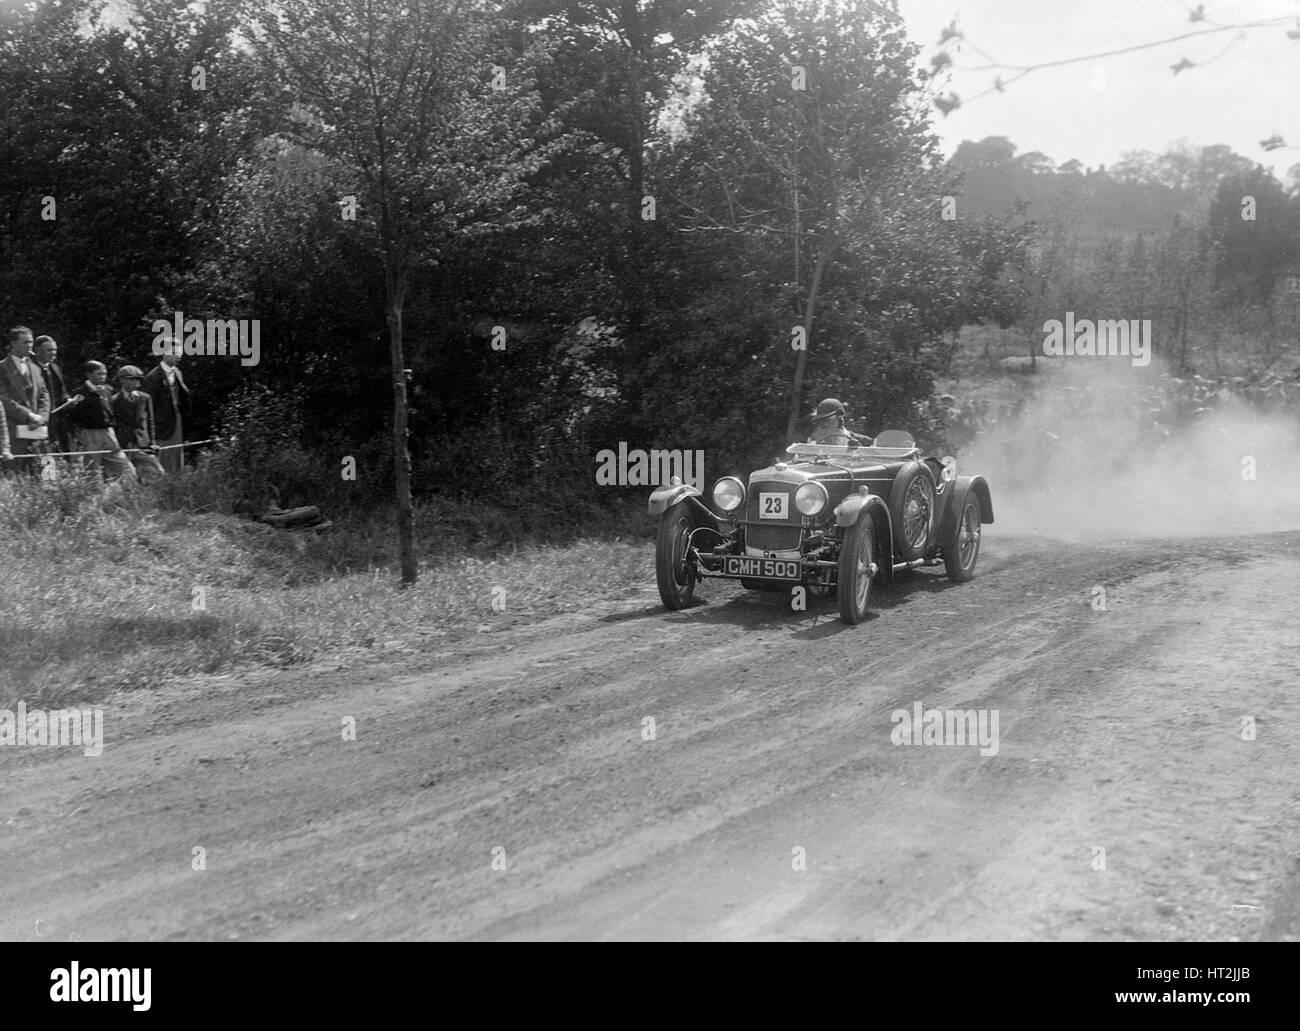 Frazer-Nash TT, Bugatti Owners Club Hill Climb, Chalfont St Peter, dans le Buckinghamshire, 1935. Artiste: Bill Brunell. Banque D'Images